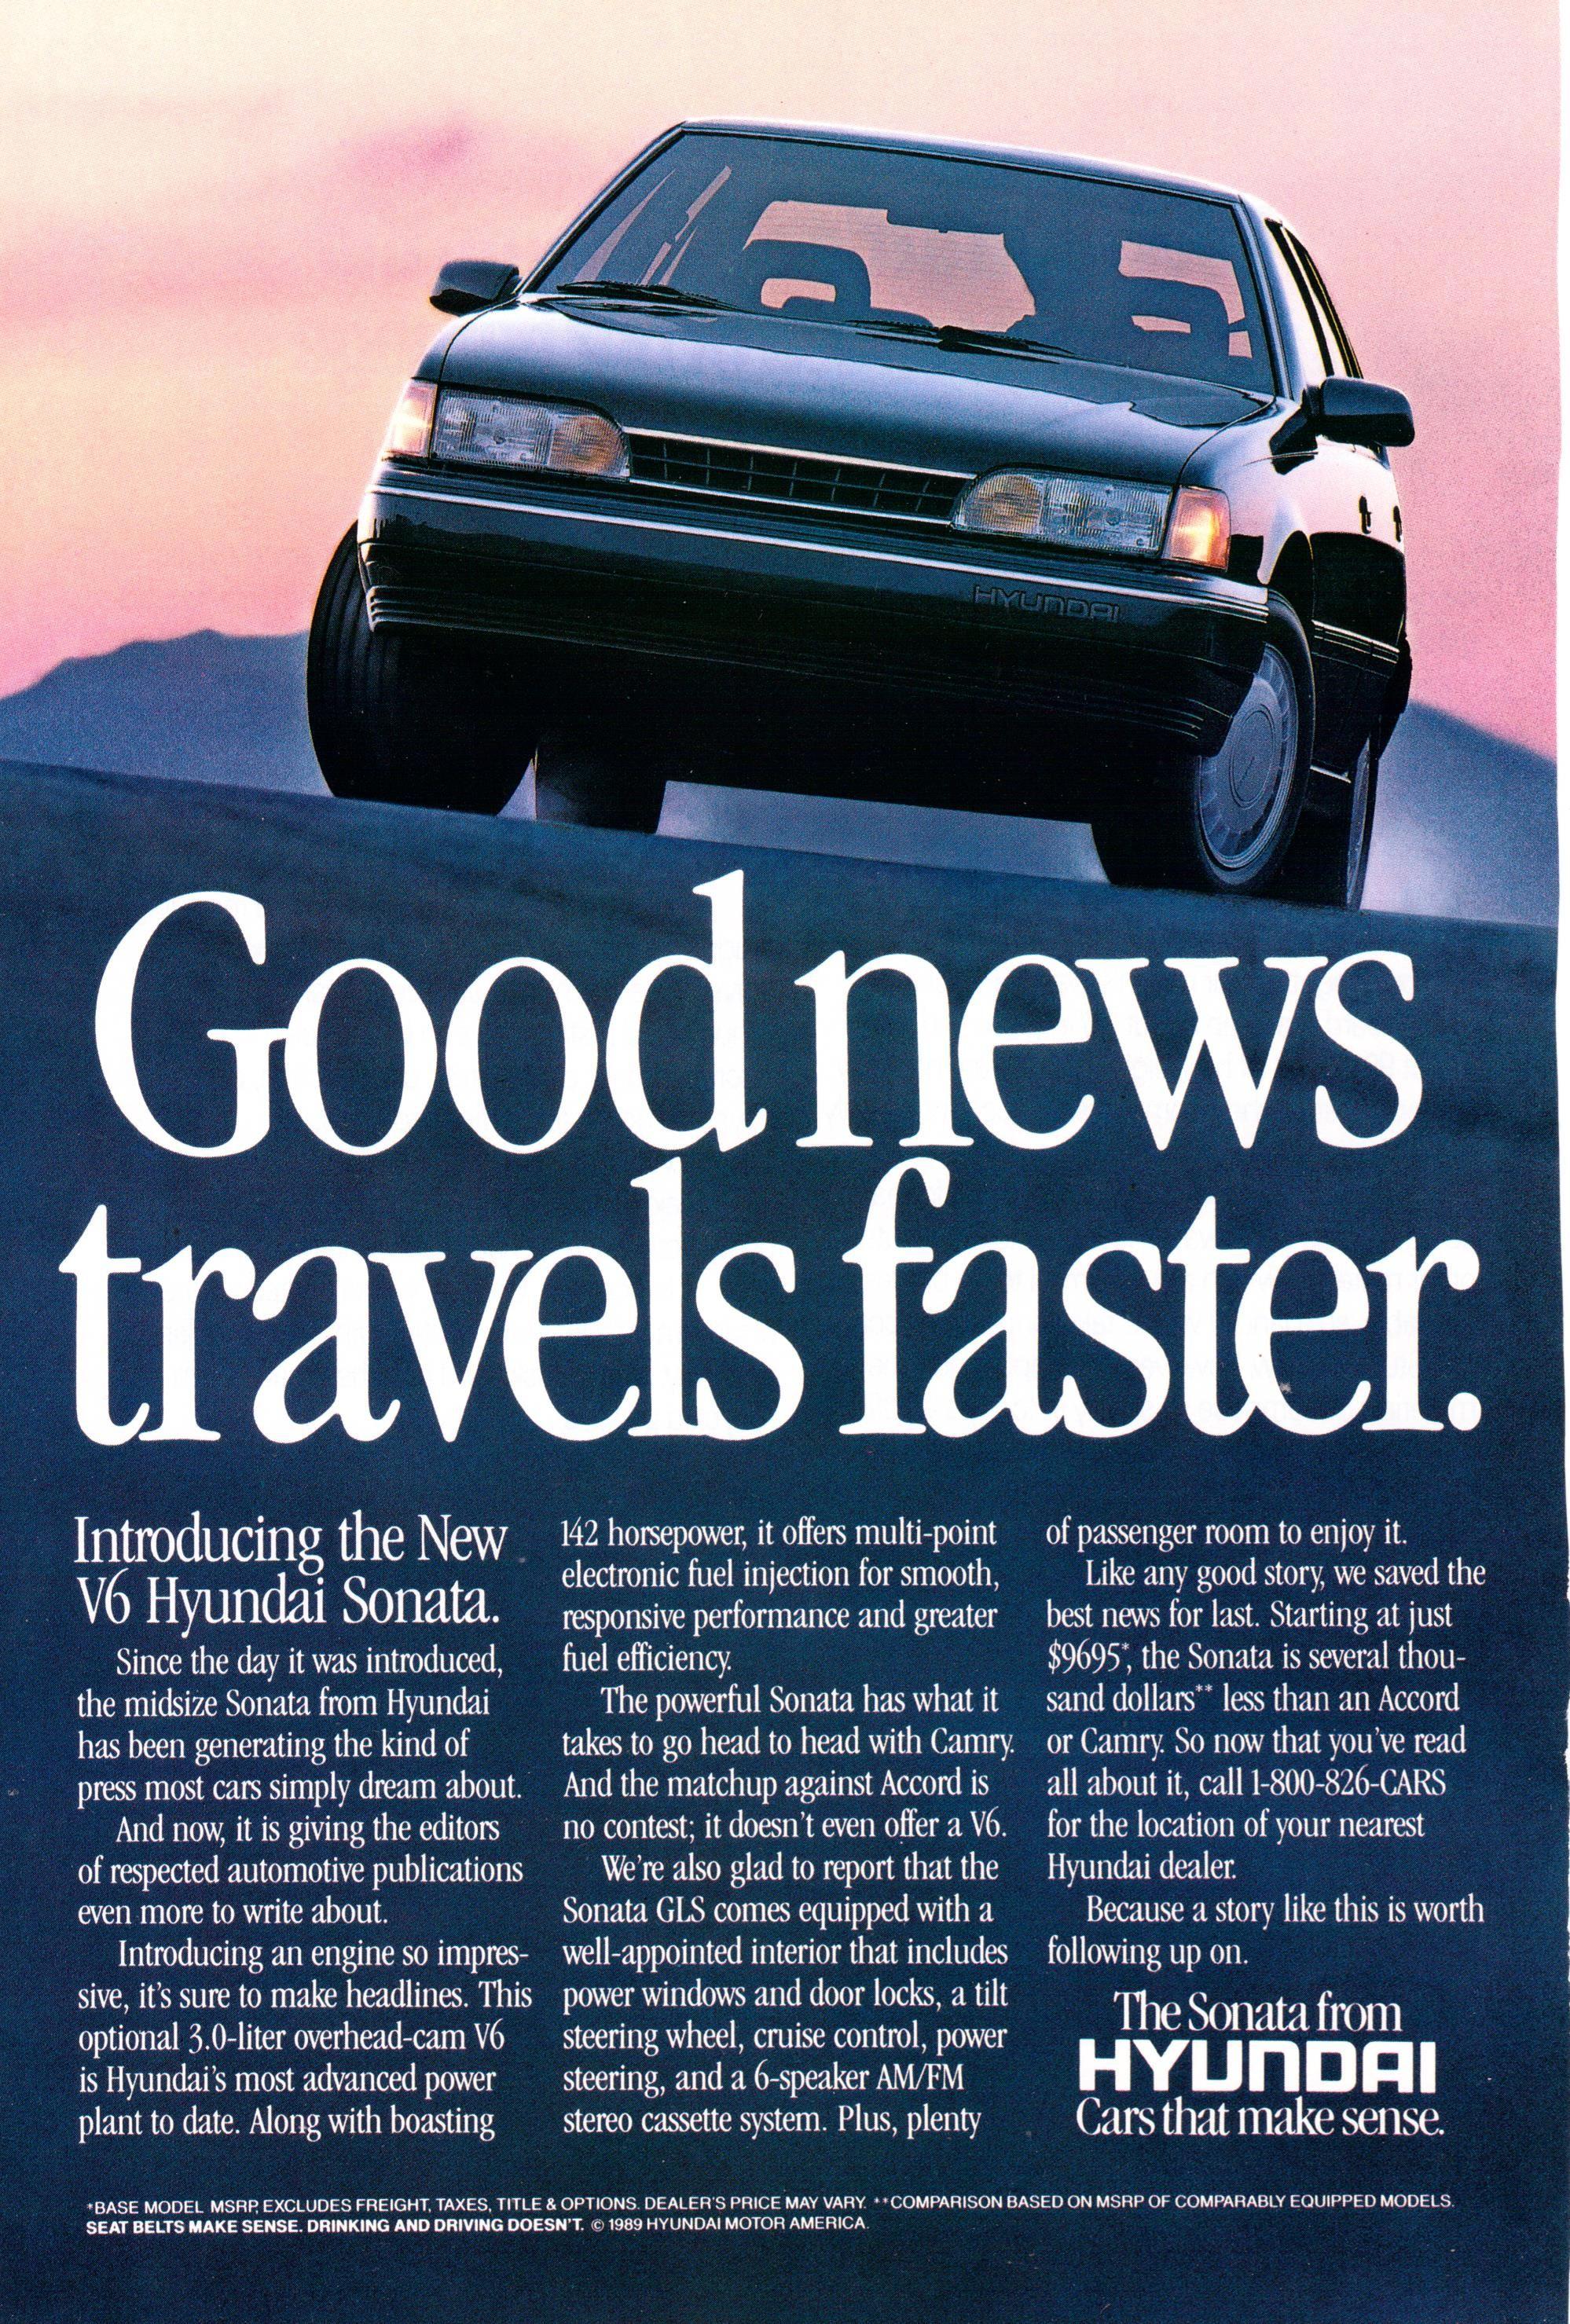 1989 Hyundai Sonata ad from National Geographic October 1989